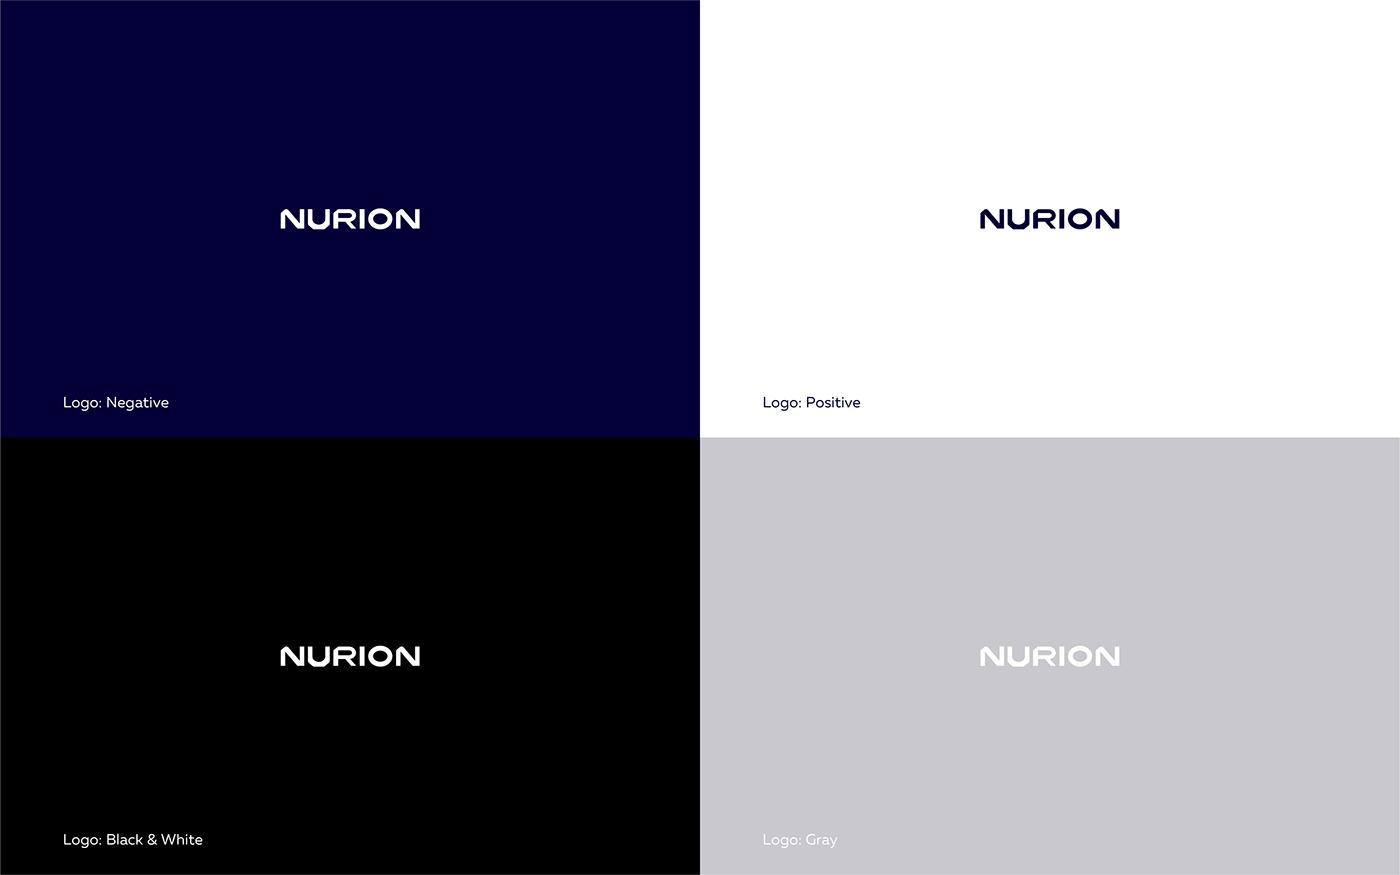 farm Software Brand ux/ui Website Russia Interface visual language naming